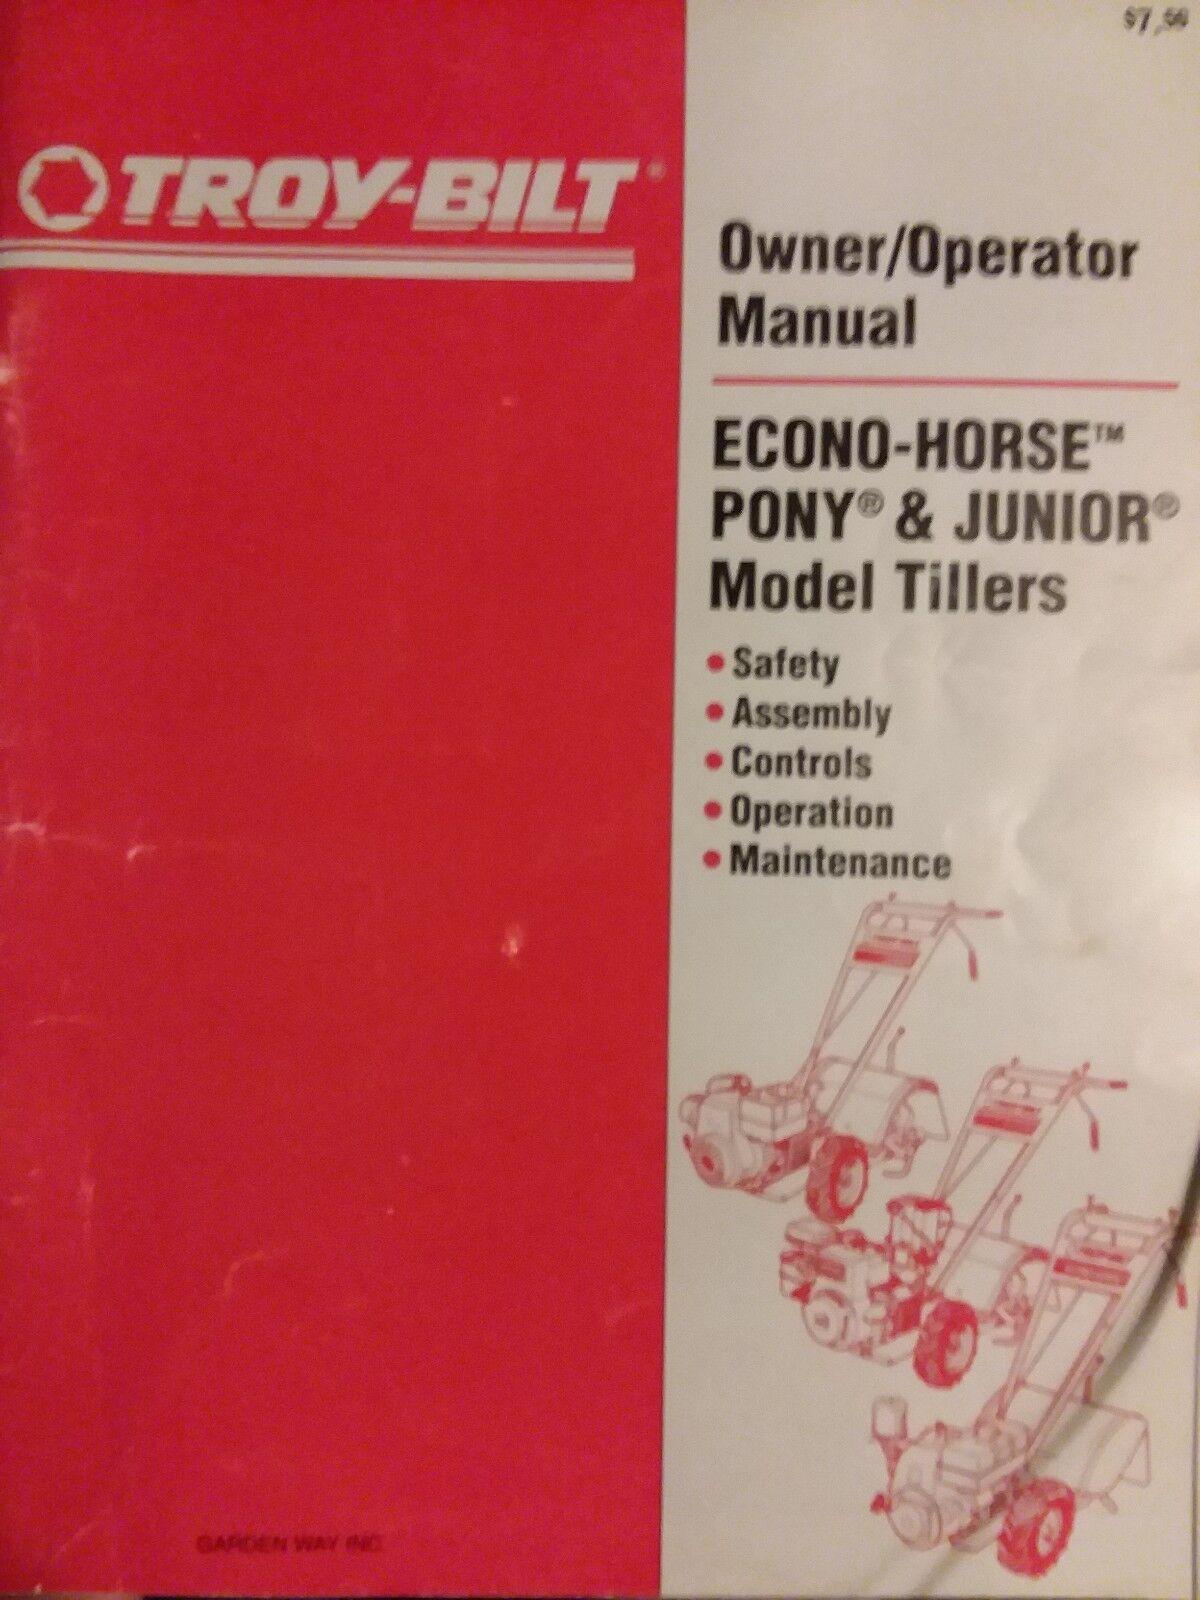 Troy-bilt 7hp pony 12211 manuals.